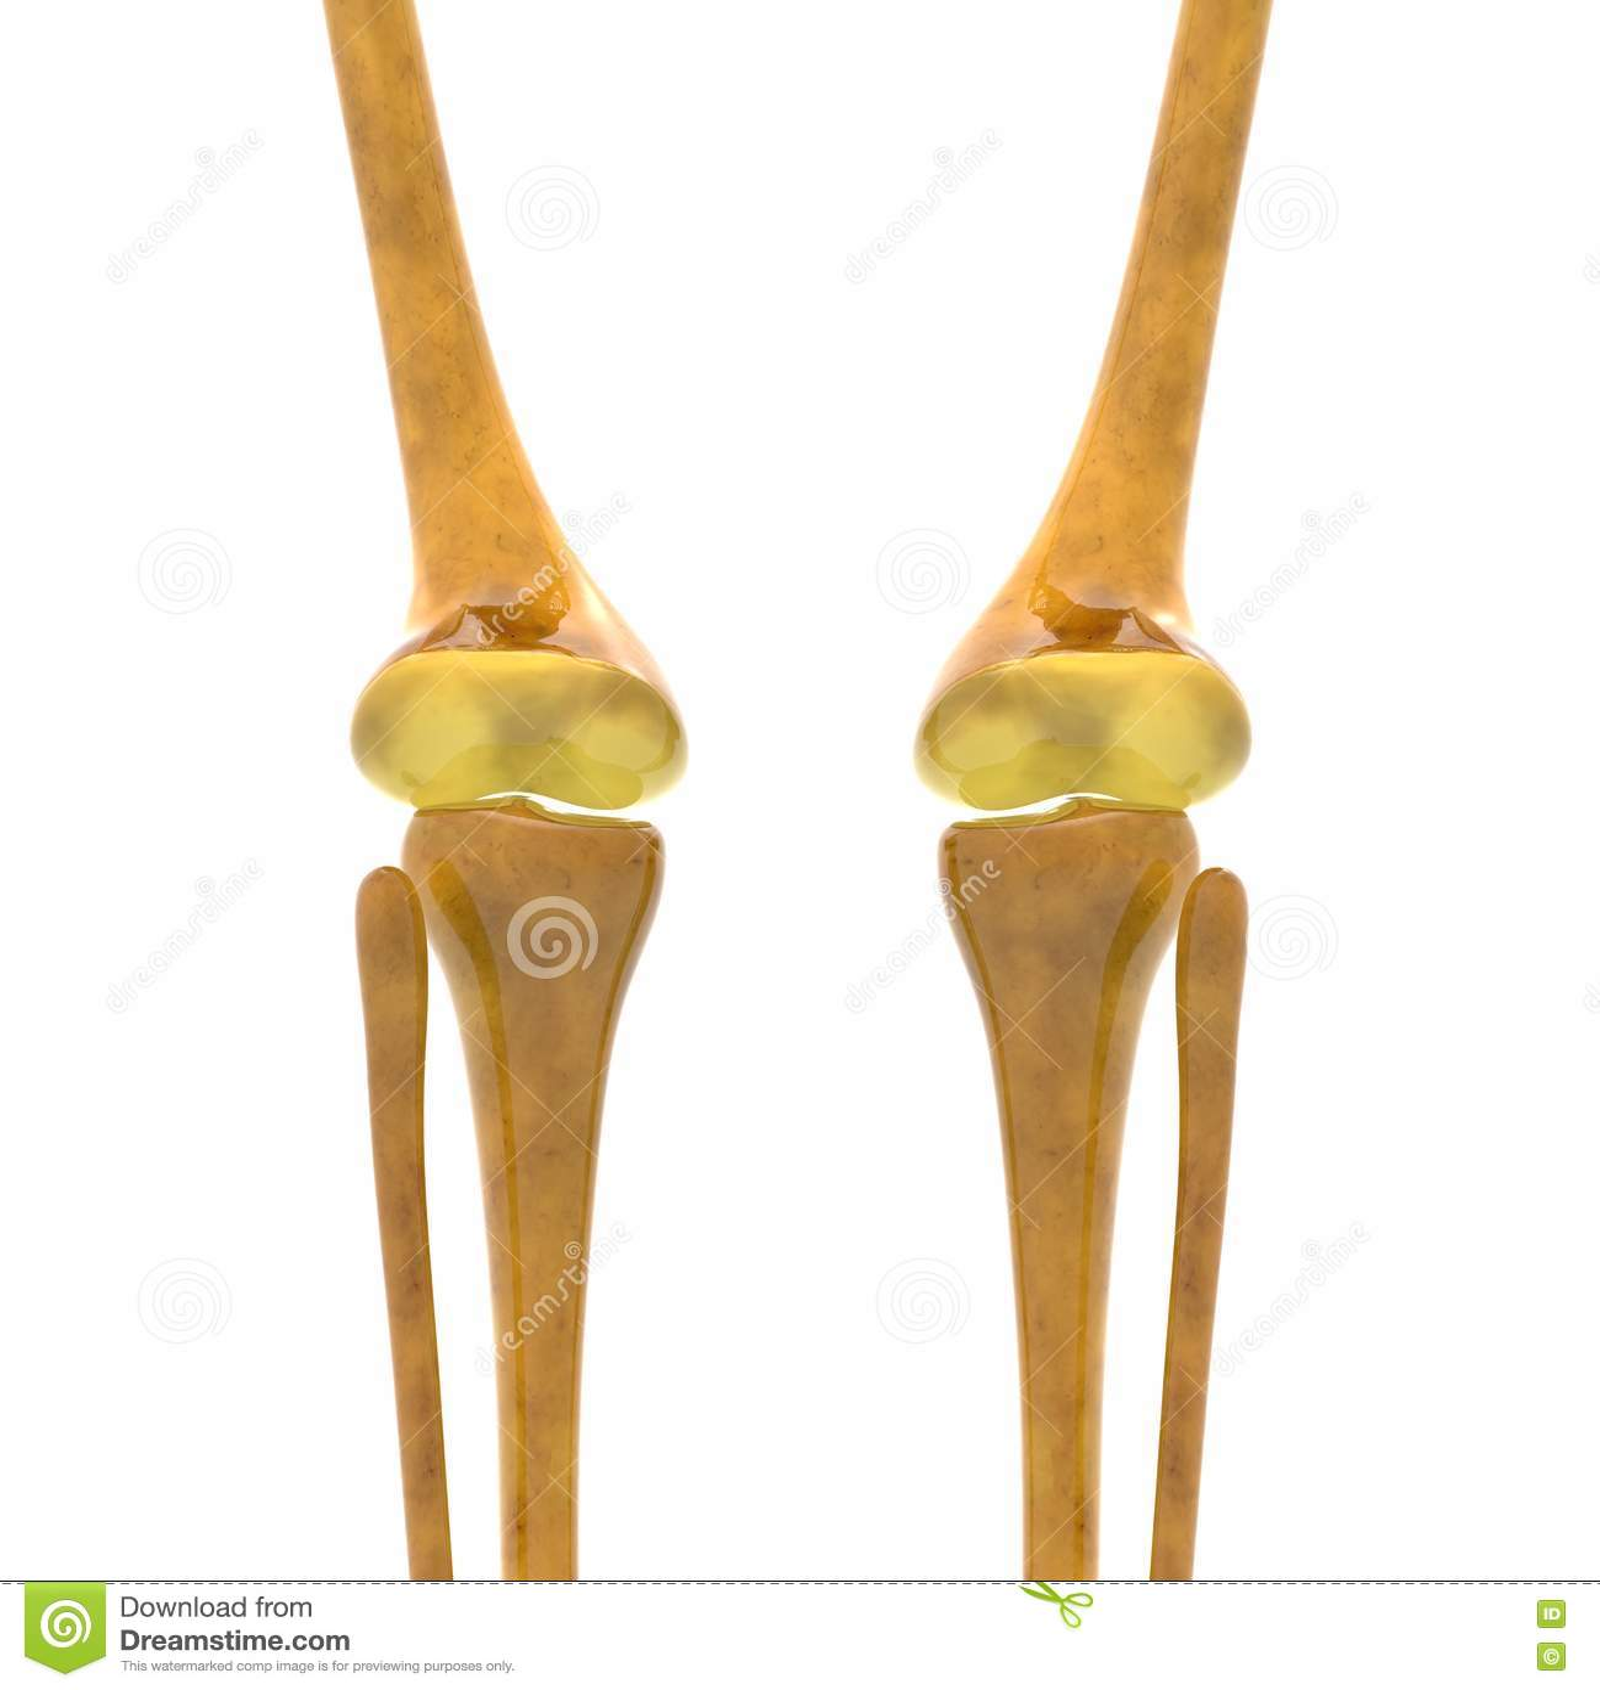 human skeleton knee joints stock illustration - image: 65665841, Skeleton